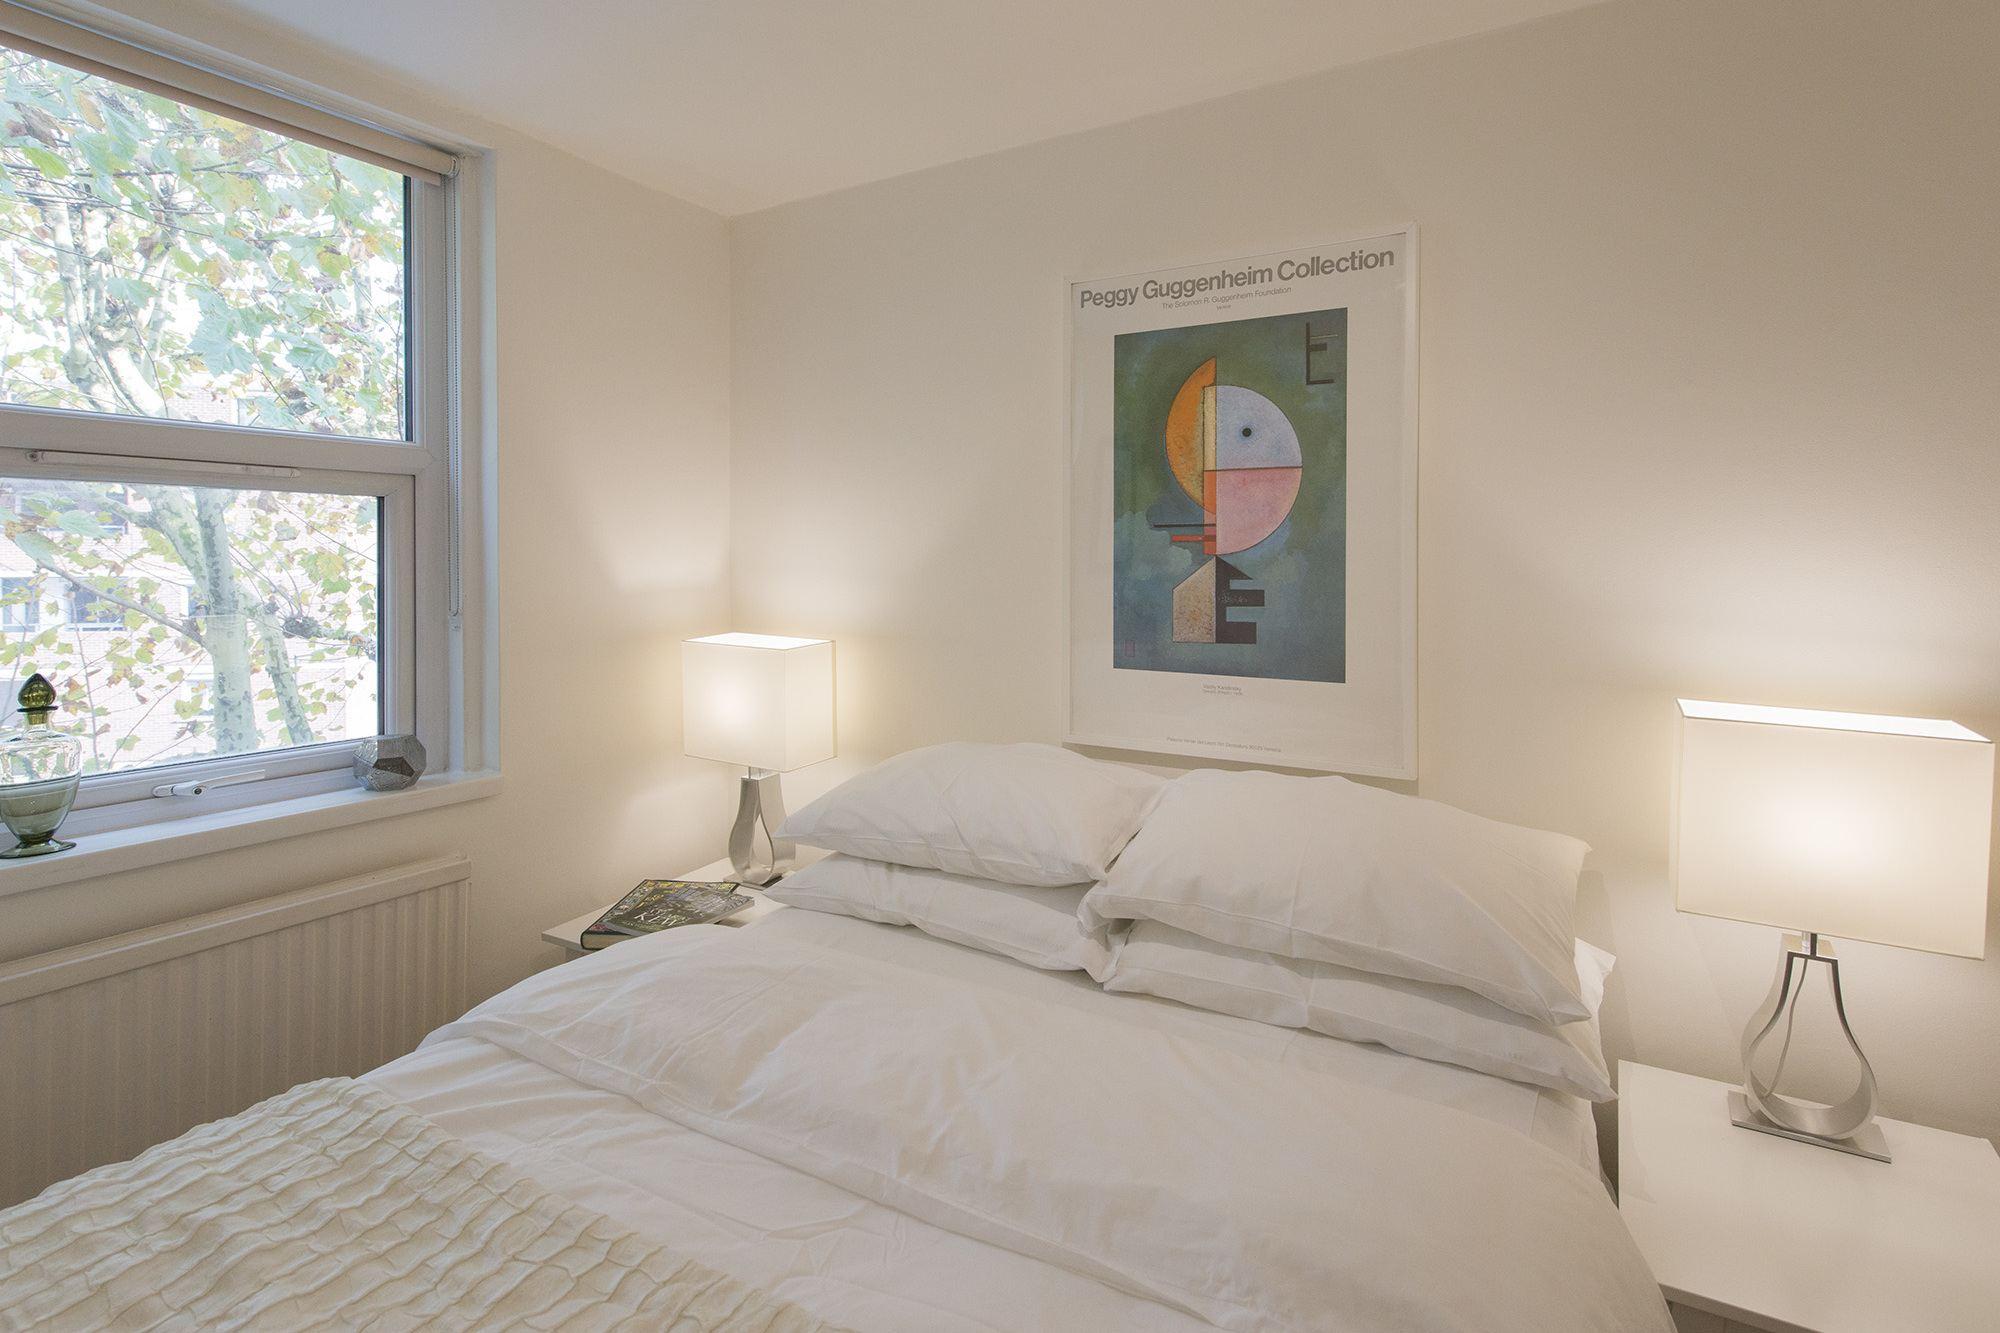 Bedroom305.jpg